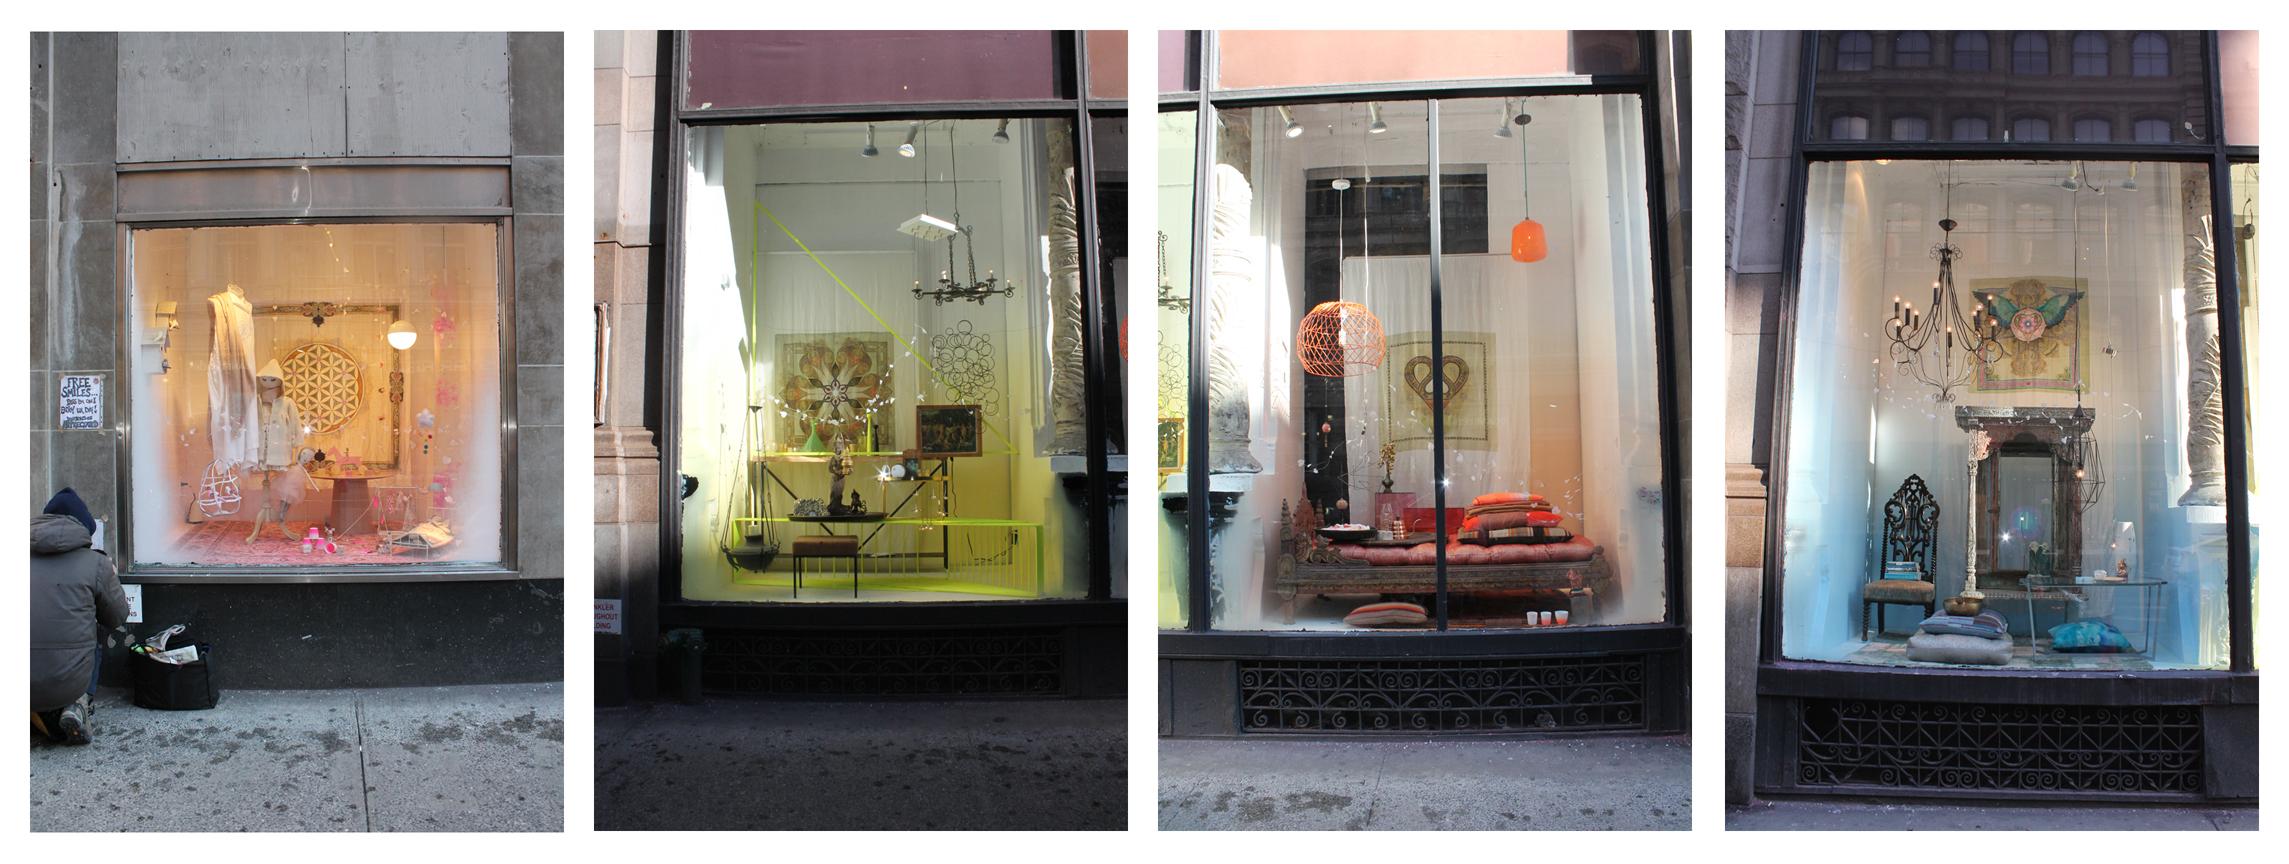 new-york-digital-fabric-printing-service-custom-designs copy.jpg